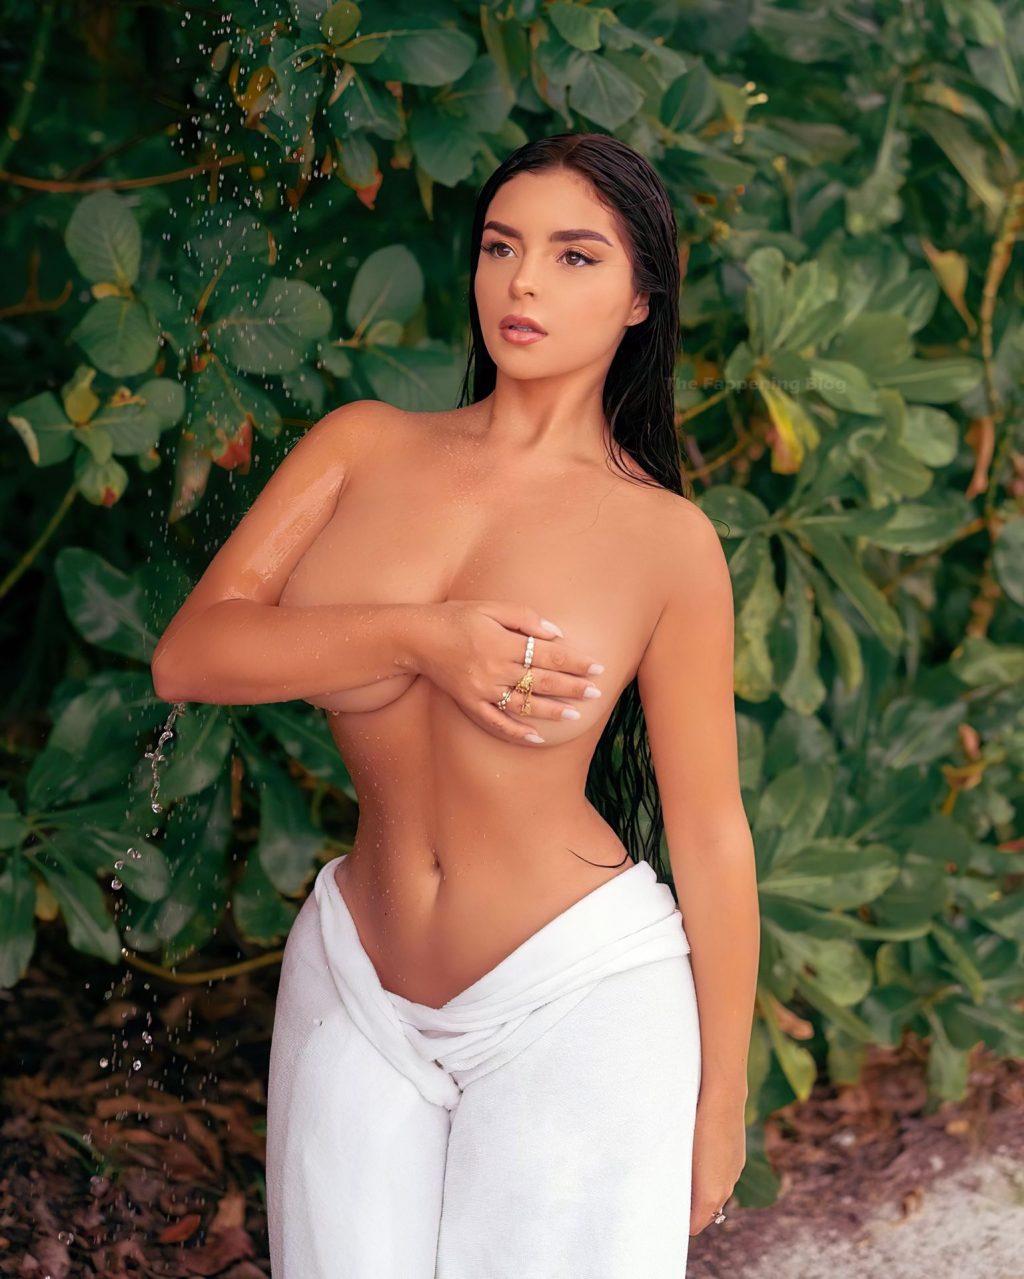 Demi Rose Poses Topless (2 Photos)